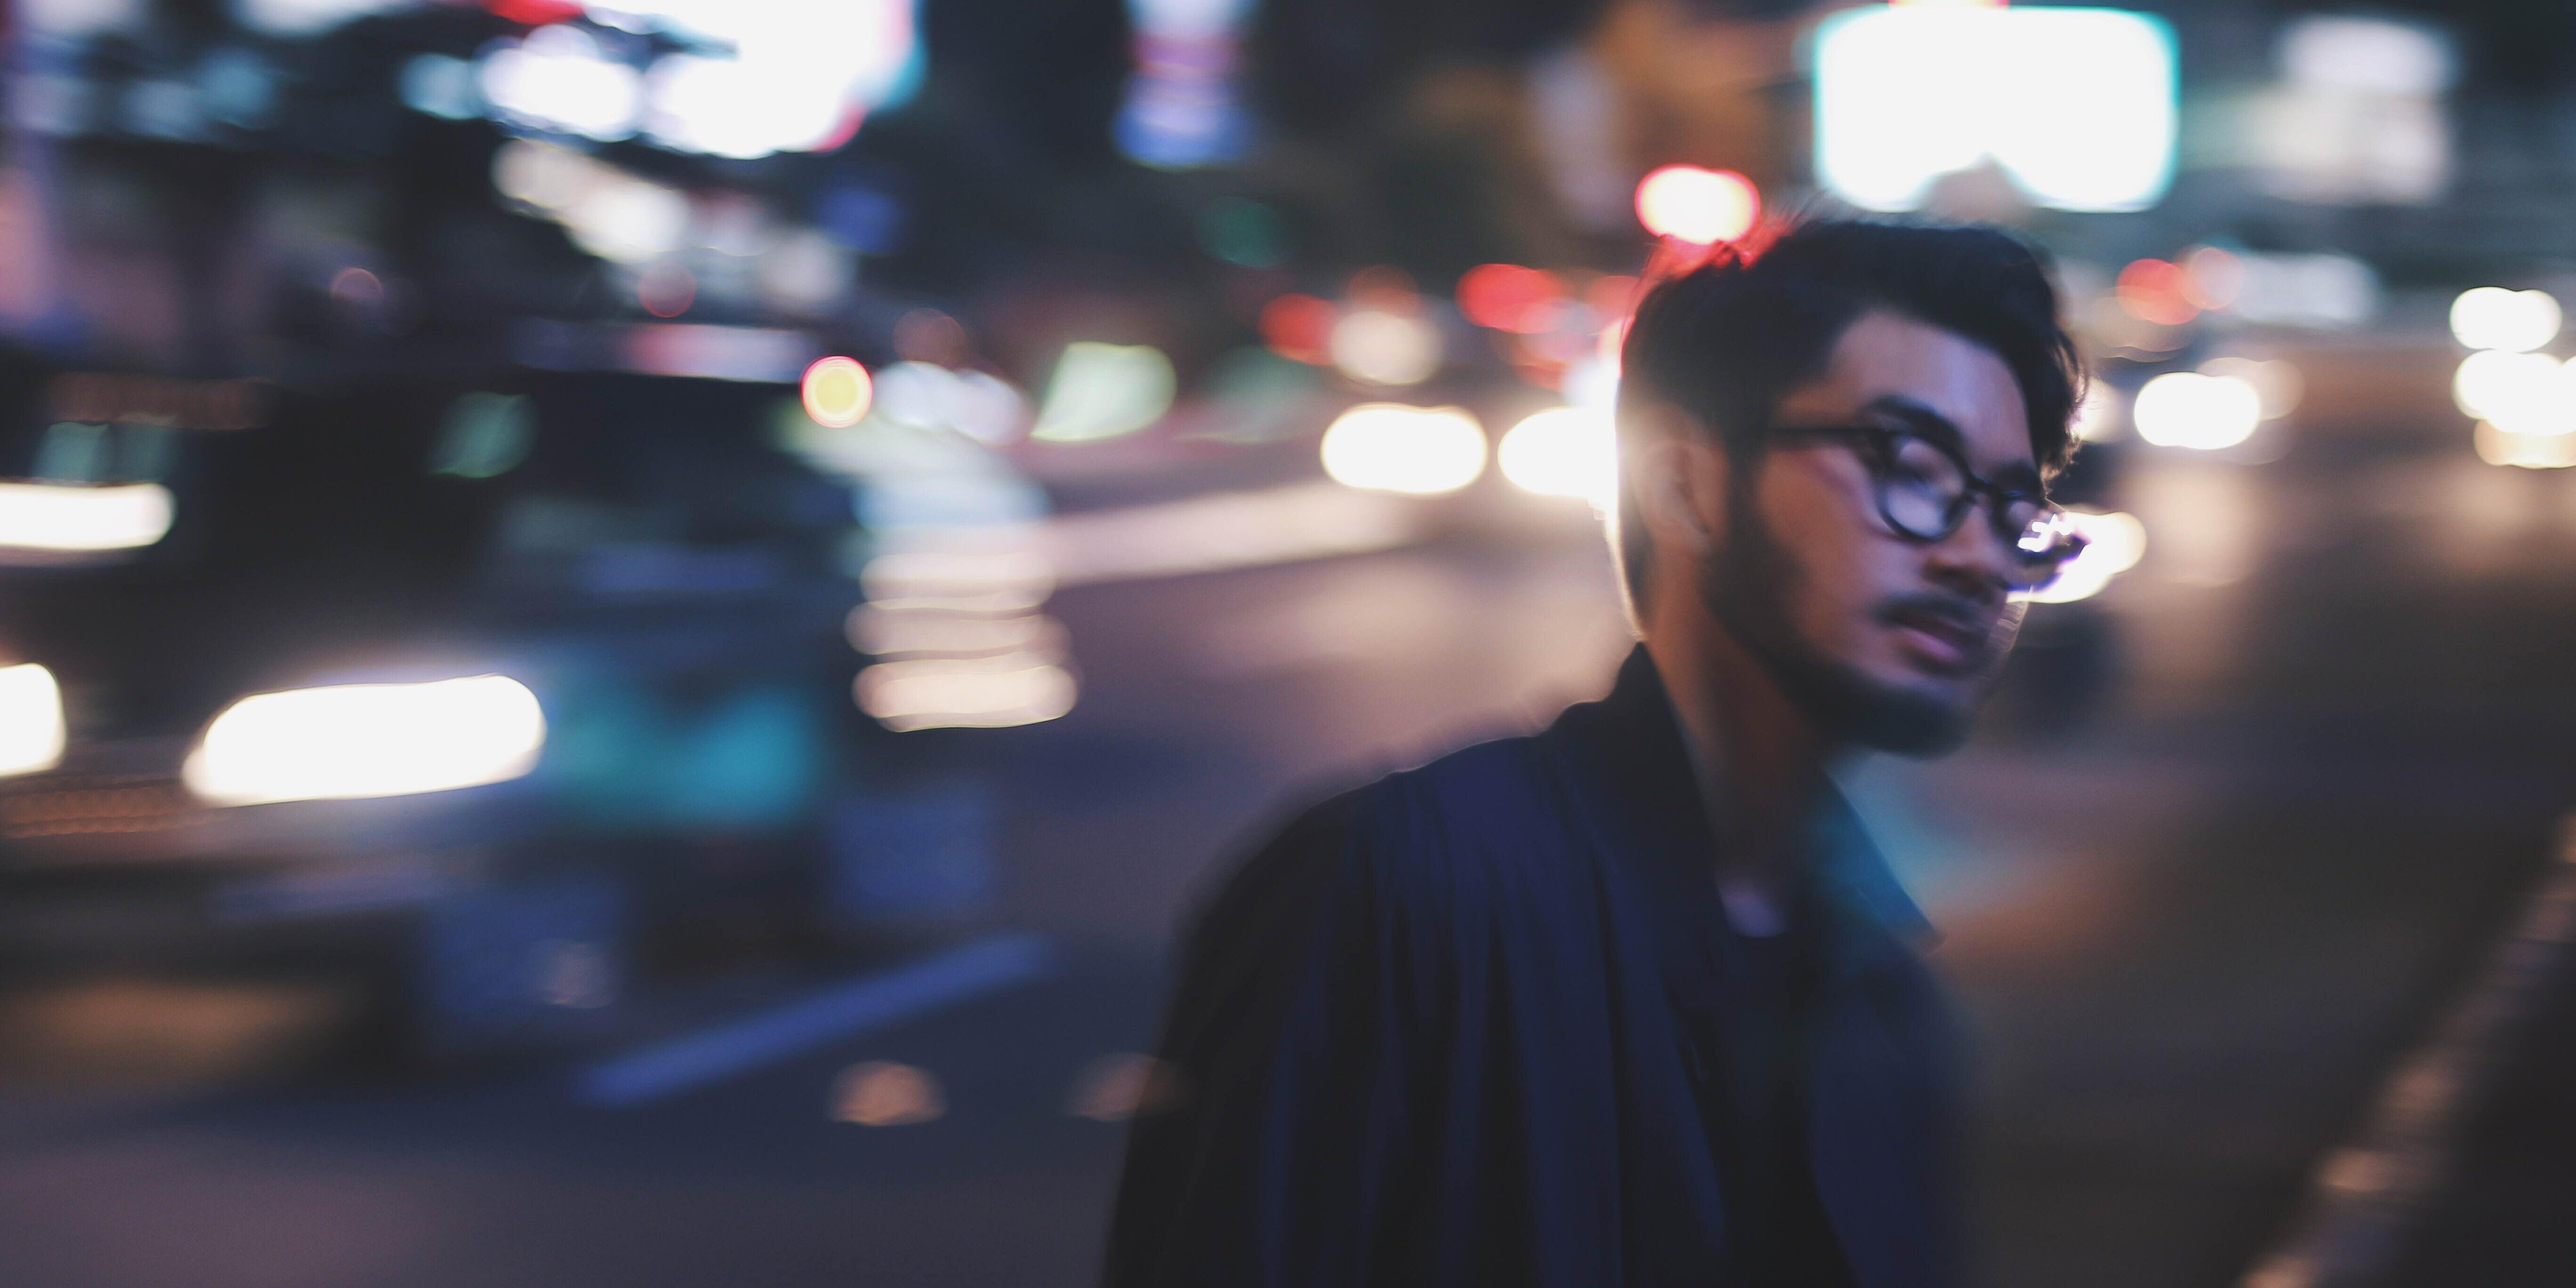 LISTEN: Jakartan R&B singer WYND breaks through with future soul debut, 'Overload'